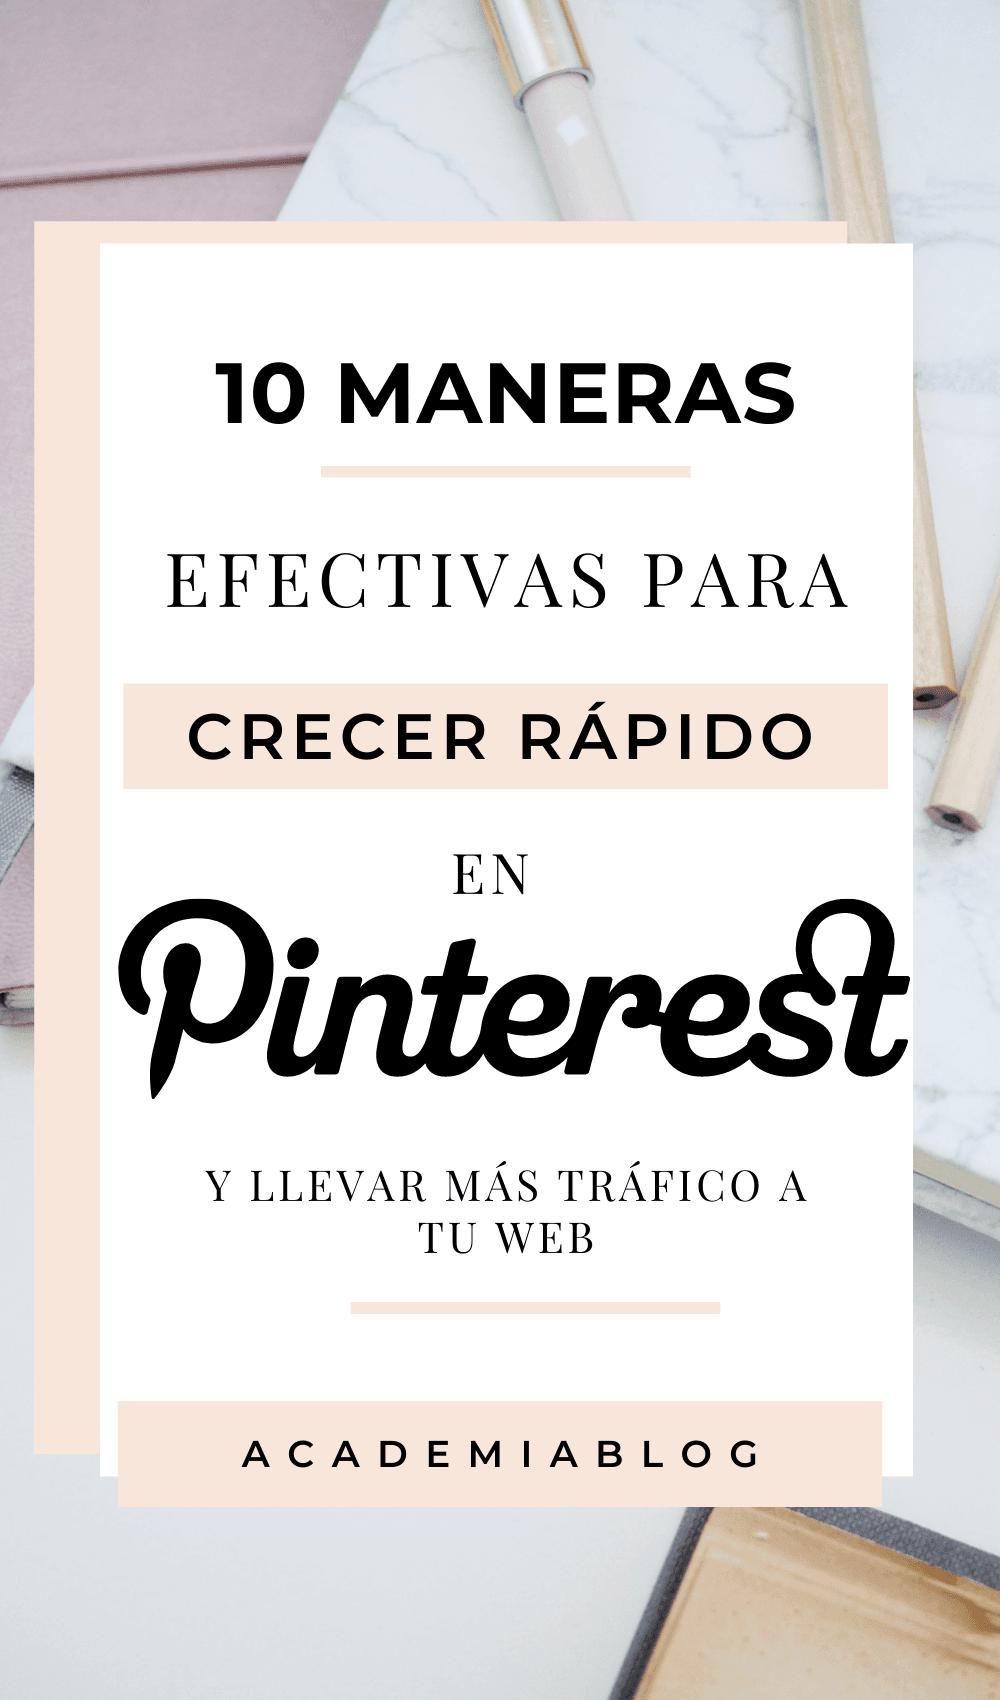 10 maneras para crecer en Pinterest